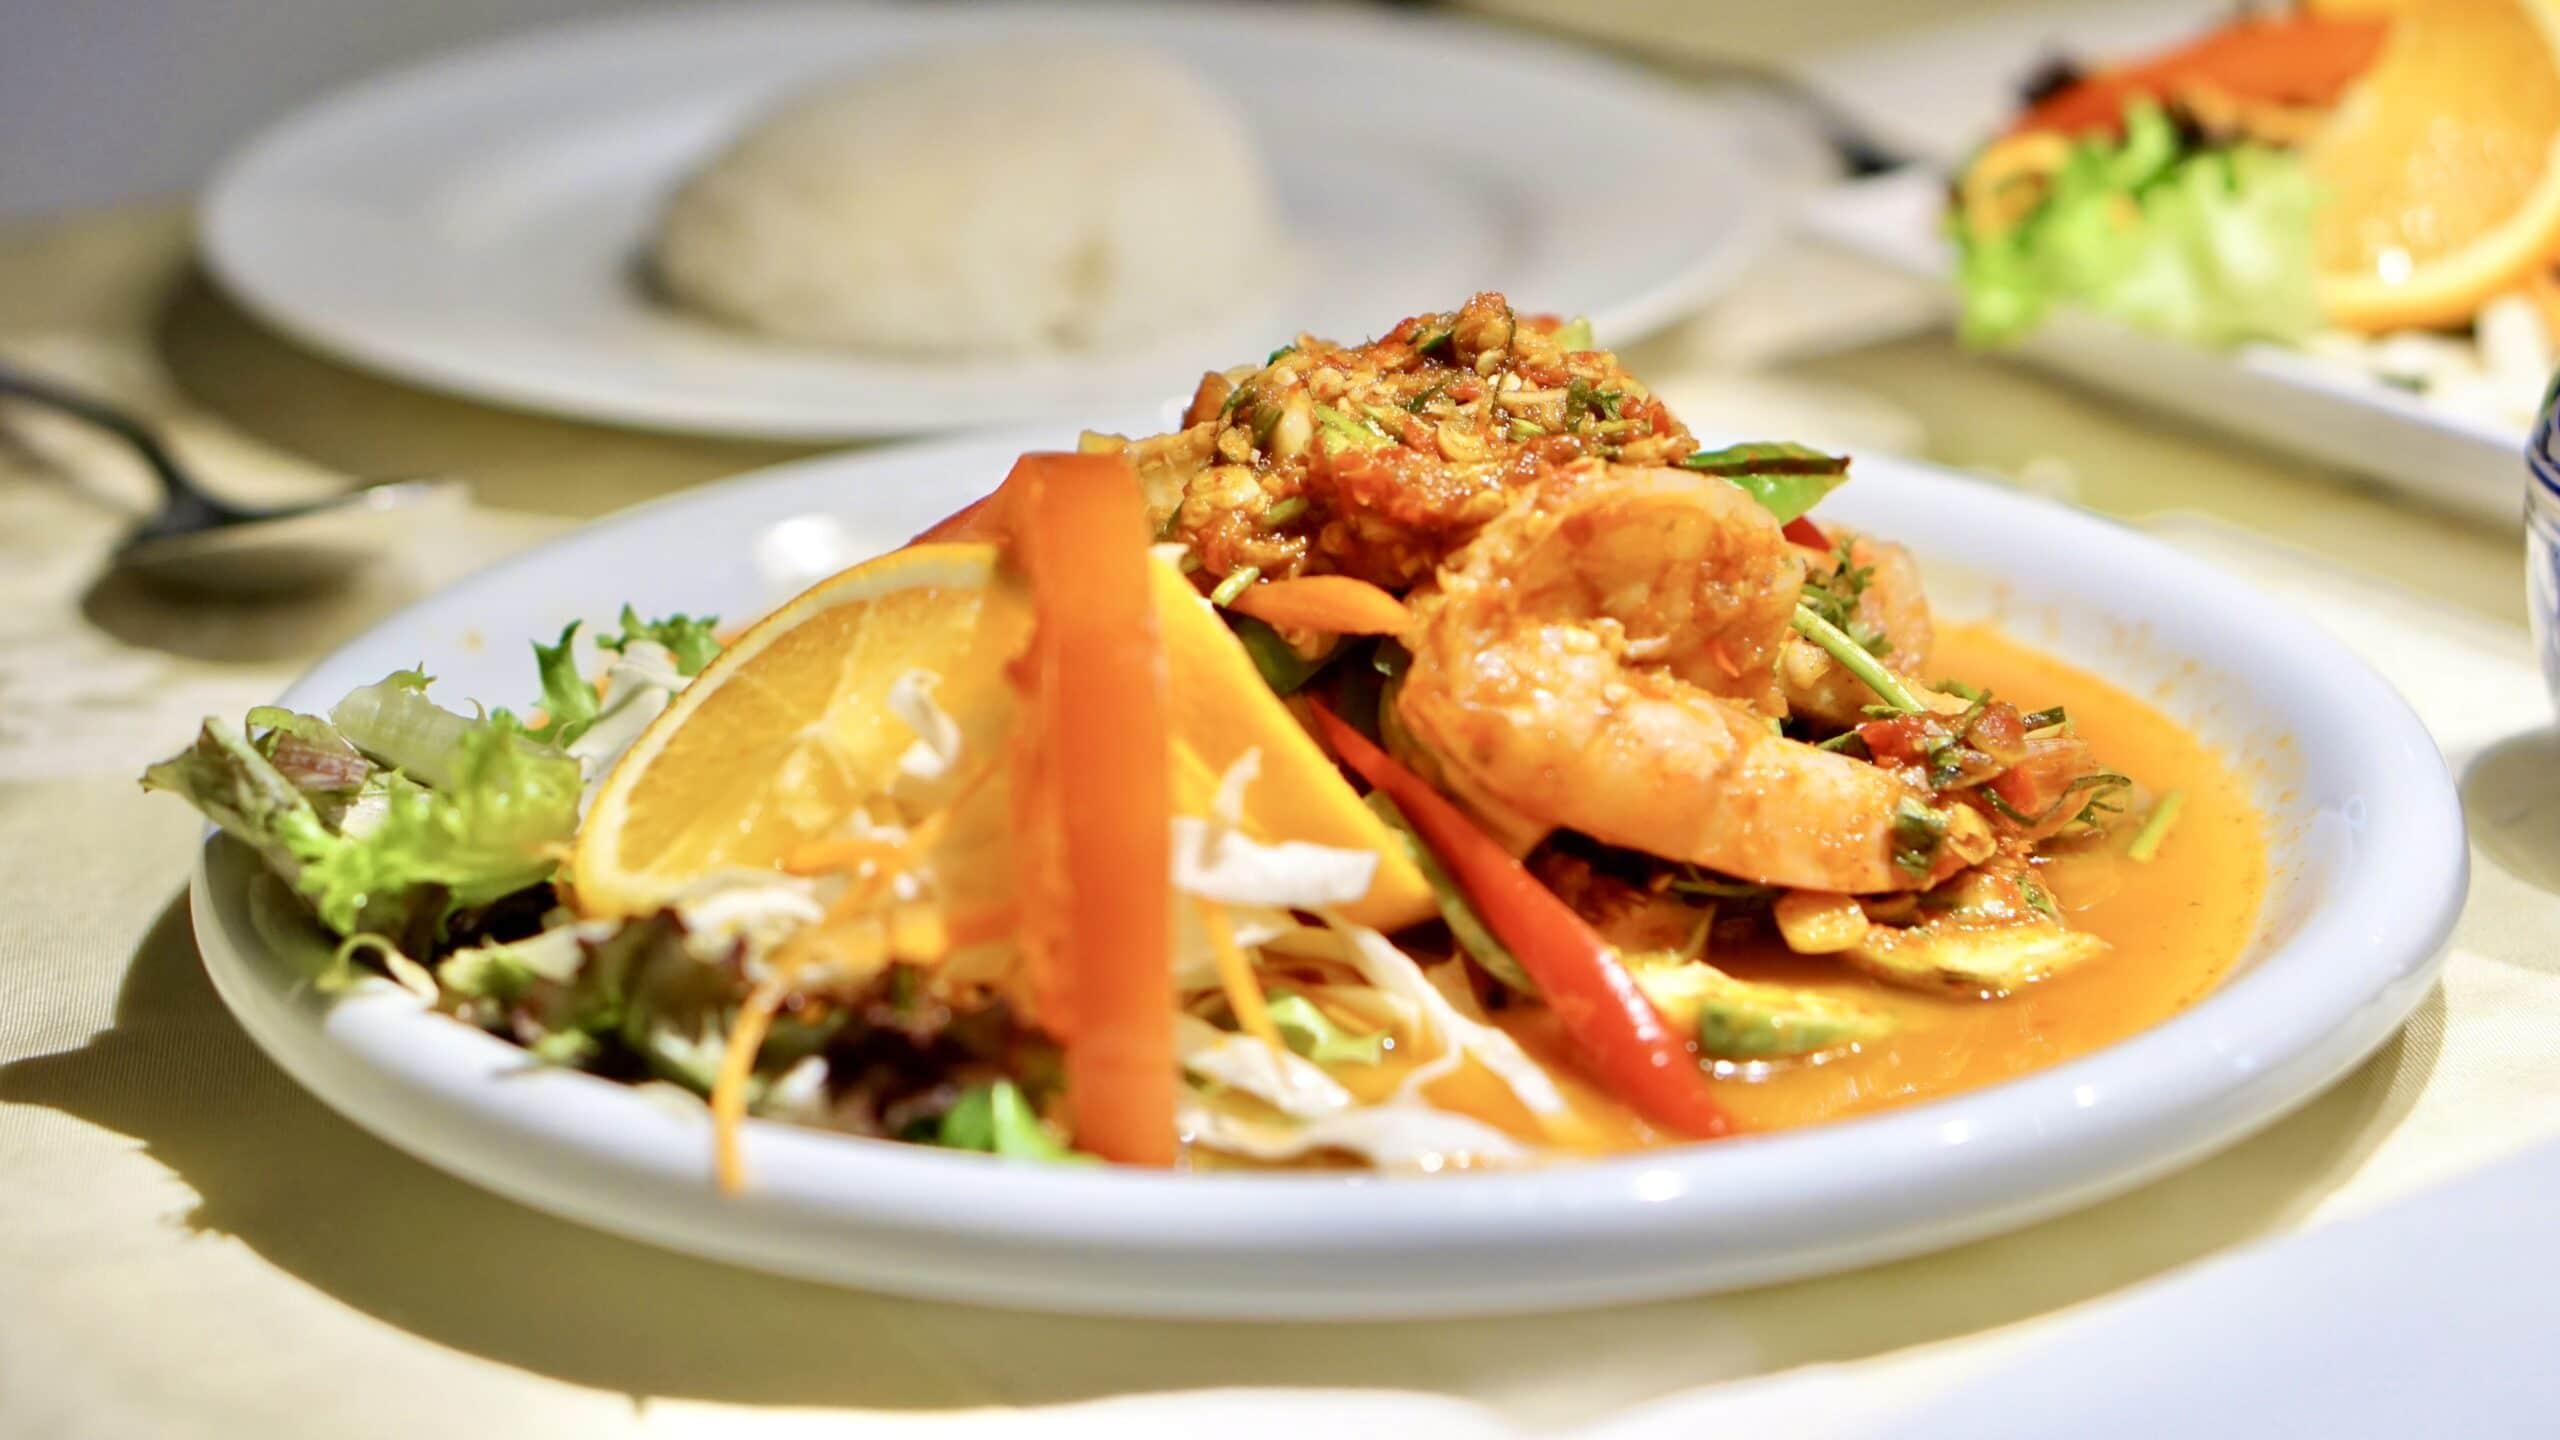 DSC05149 1 scaled Tha Chang Stuttgart Authentic Thai Food